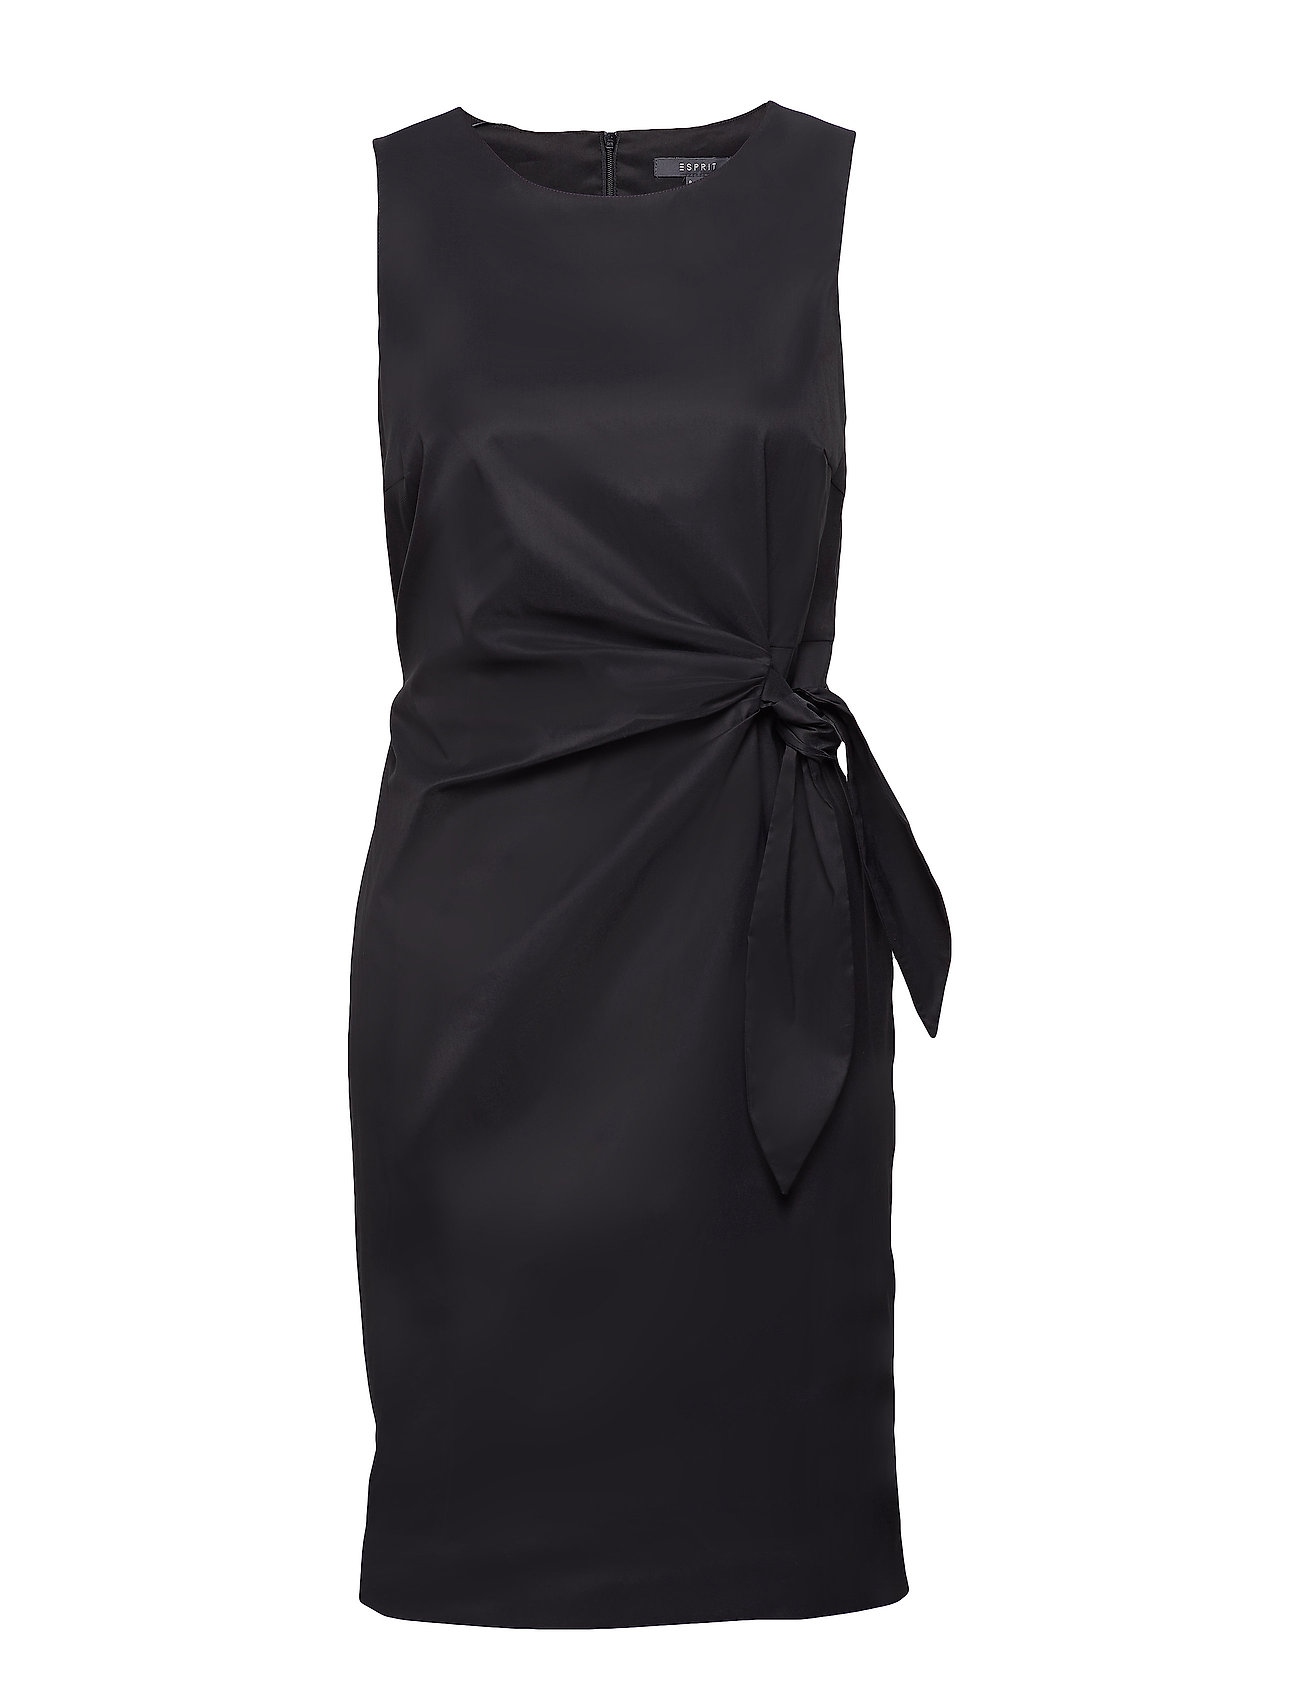 Collection Dresses Light Light Light Collection Dresses WovenblackEsprit WovenblackEsprit Dresses WovenblackEsprit CtdxsBrhQ